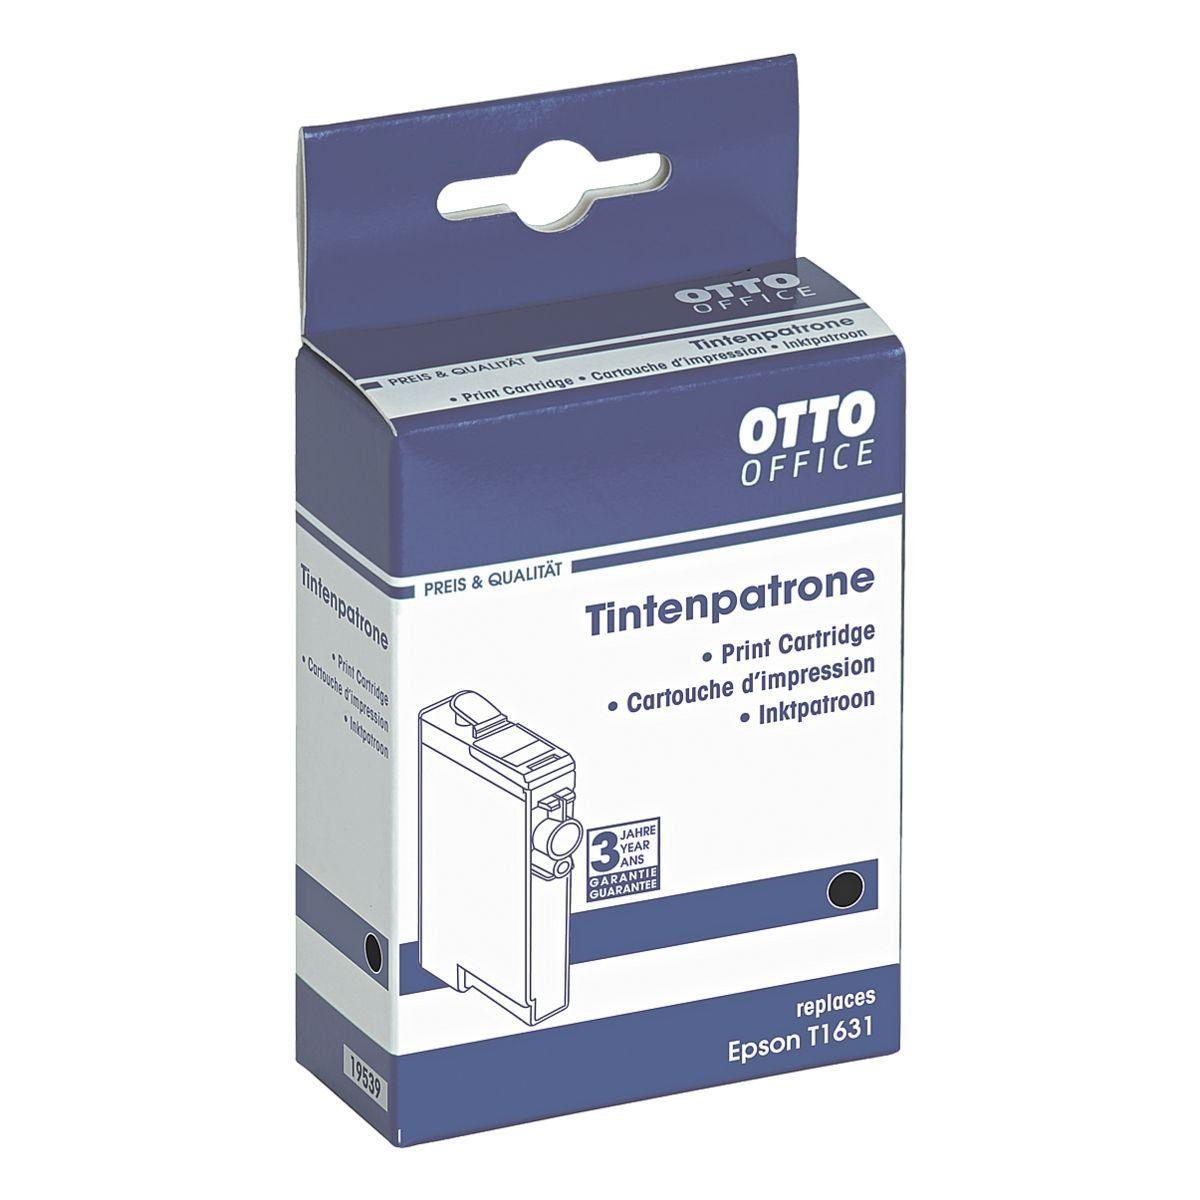 OTTO Office Standard Tintenpatrone ersetzt Epson »T1631XL«